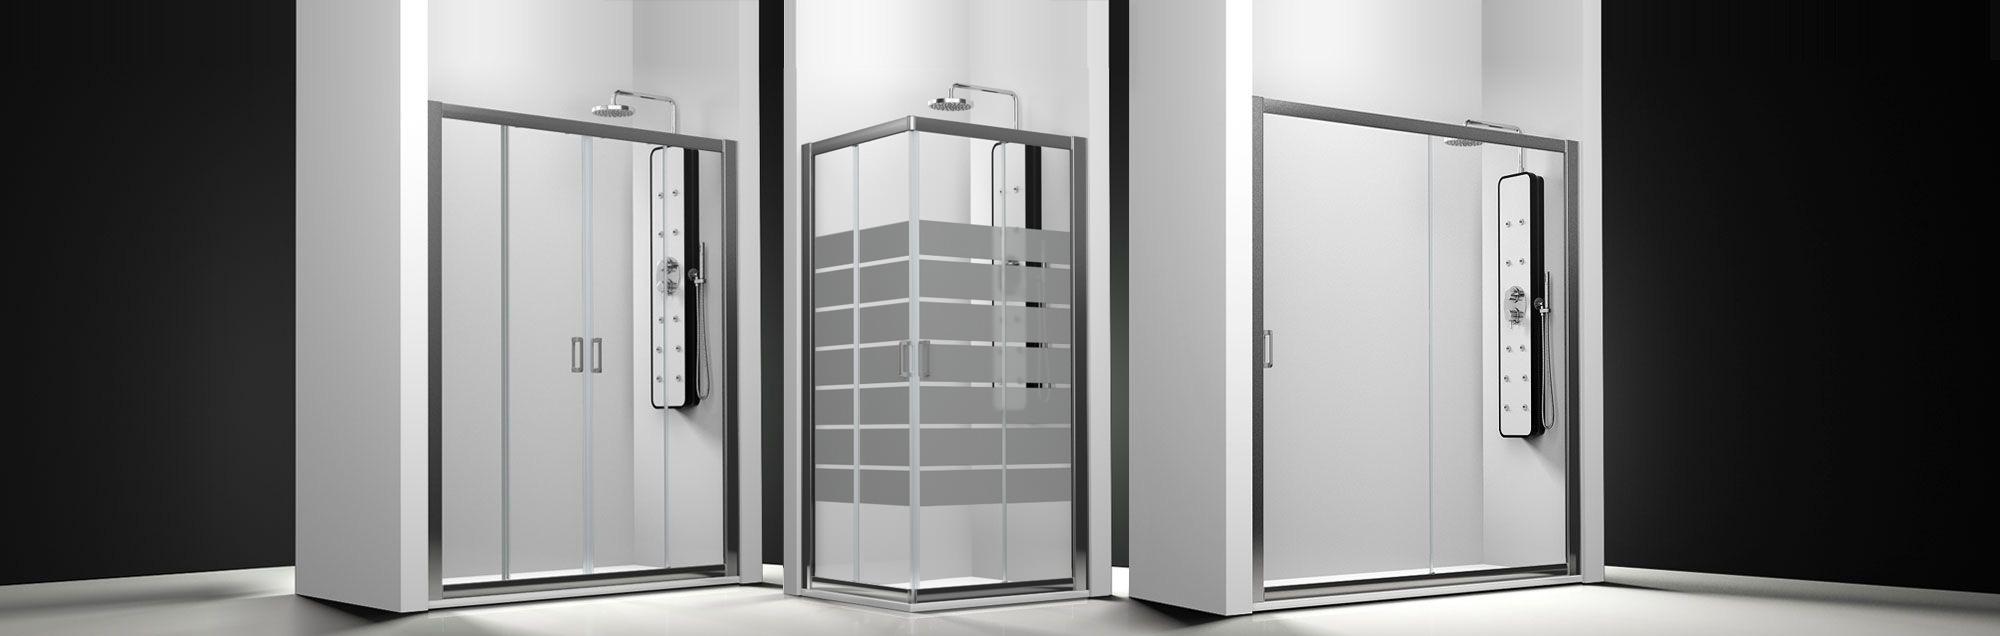 Serie Spring de mamparas standard de ducha a medida